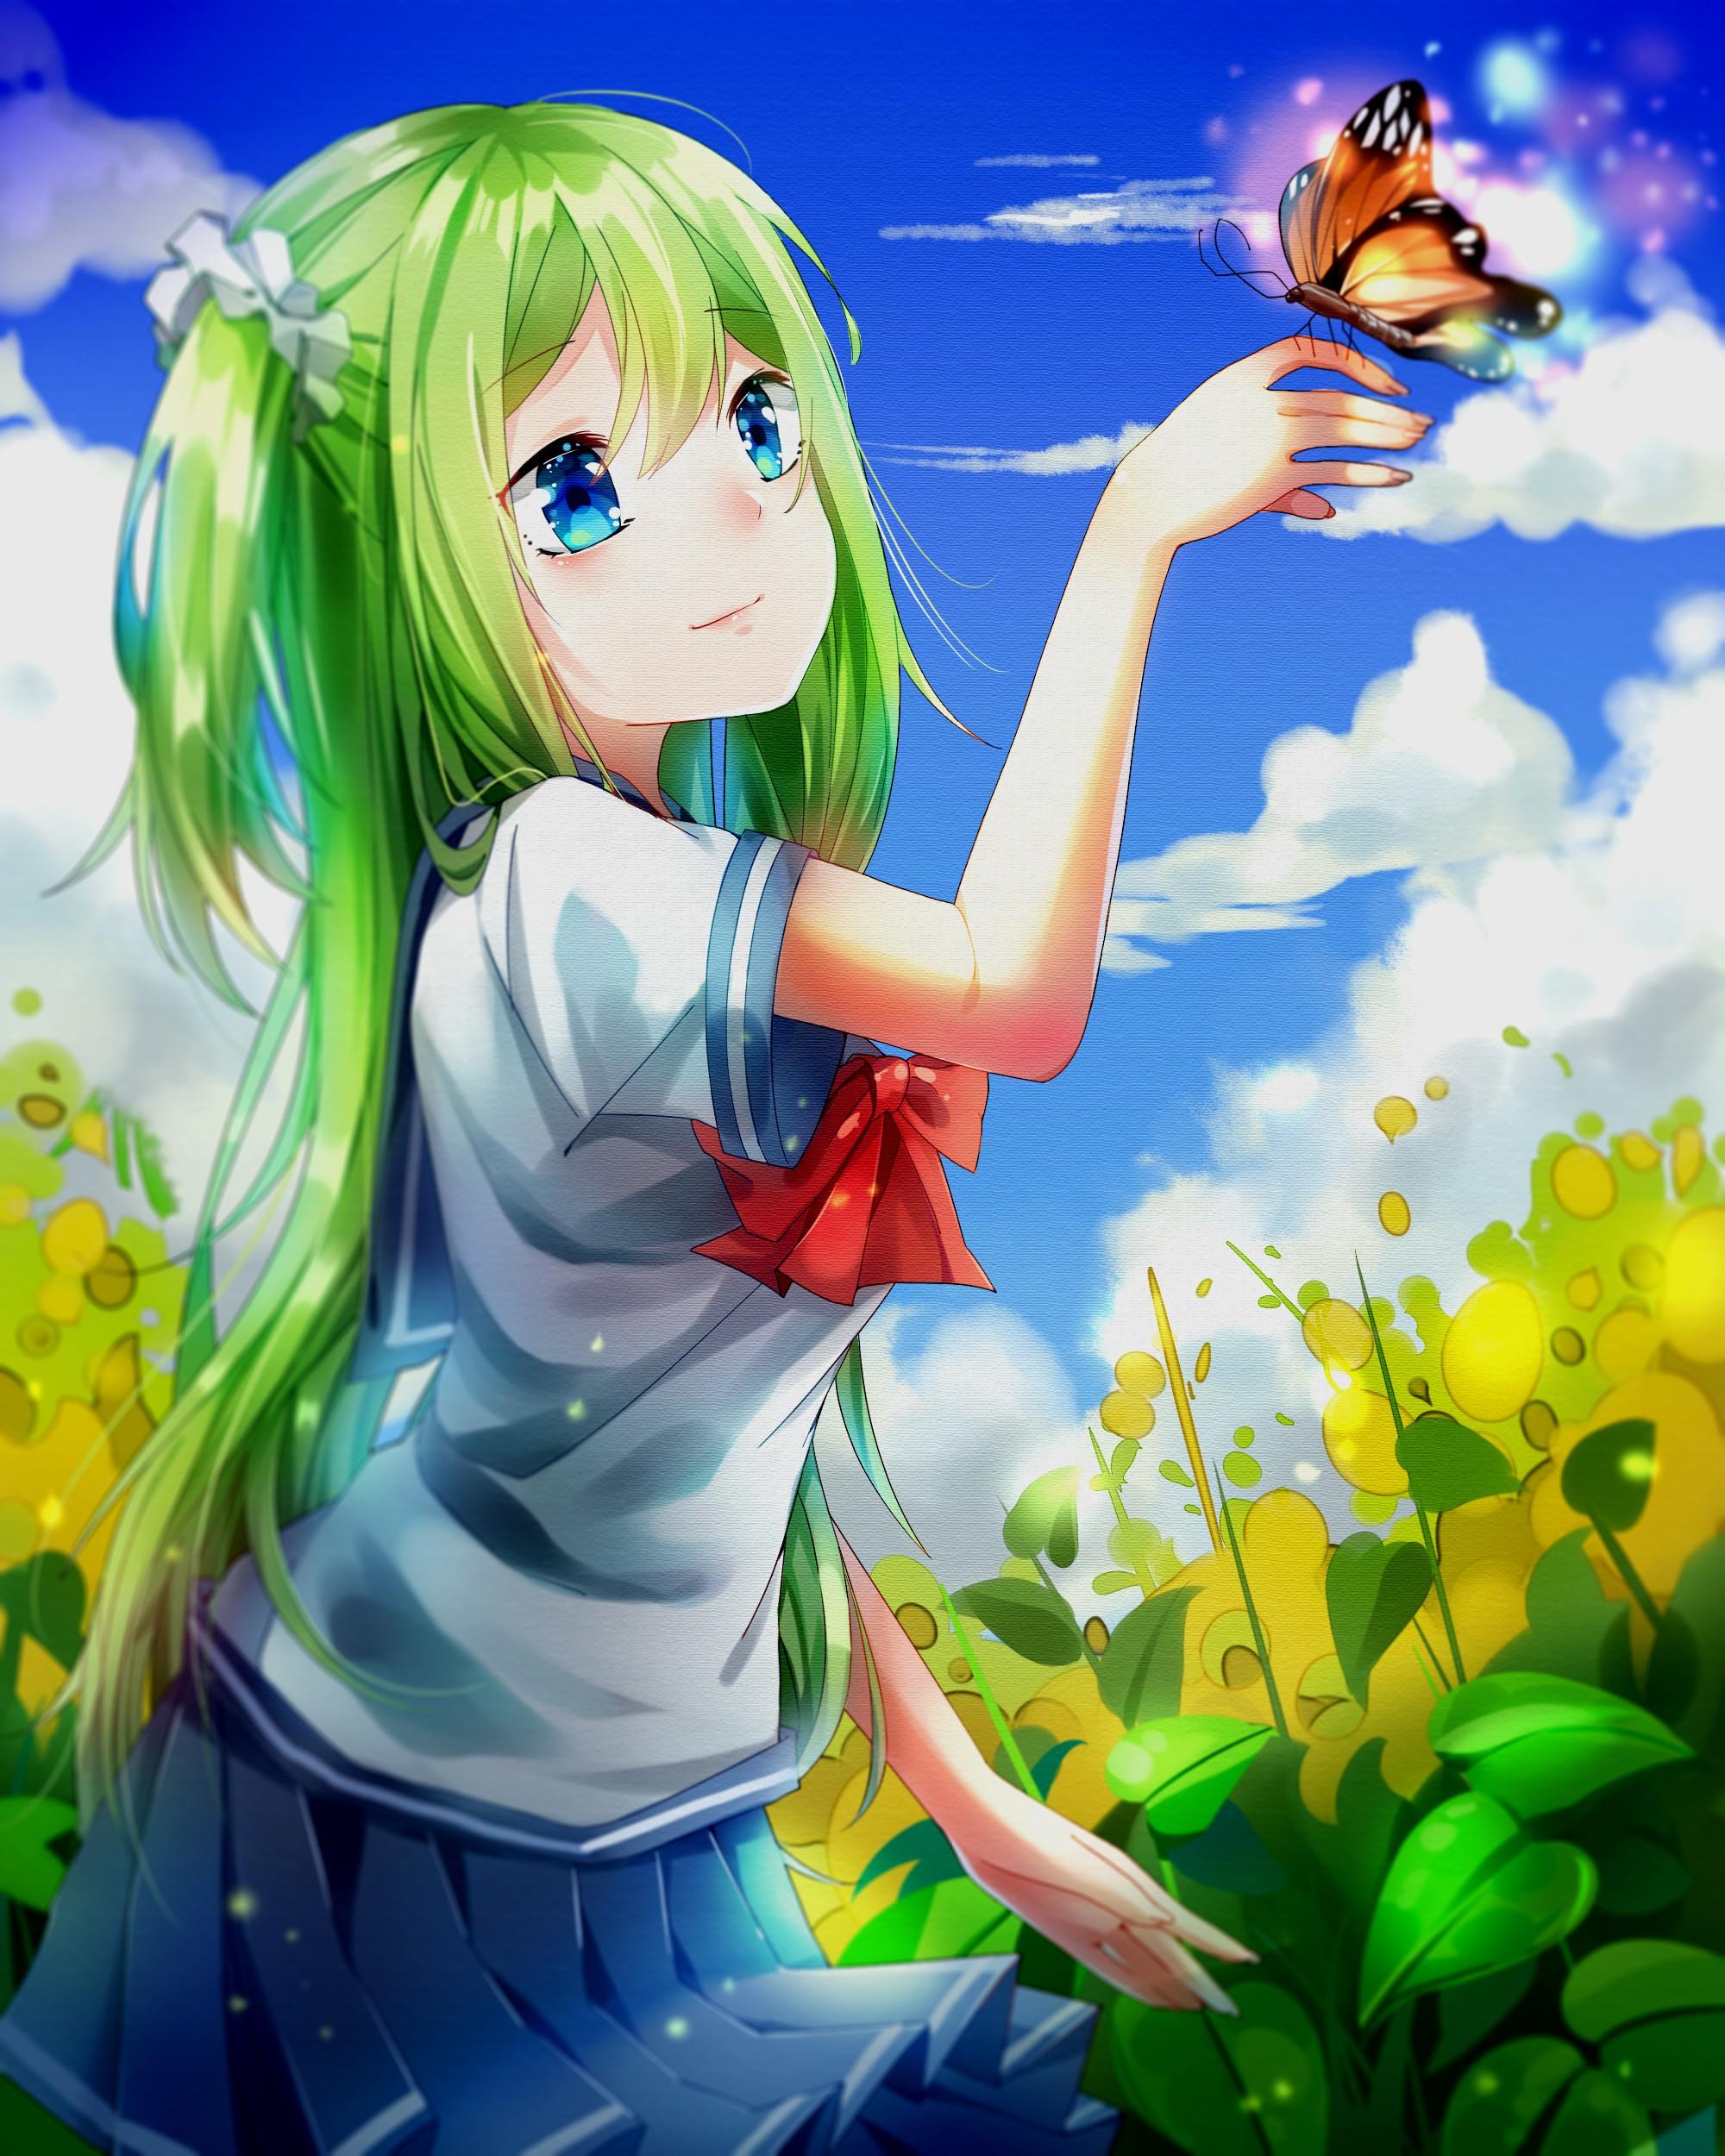 Illustration Long Hair Anime Girls Blue Eyes Sky Clouds Butterfly Cartoon Green Computer Wallpaper